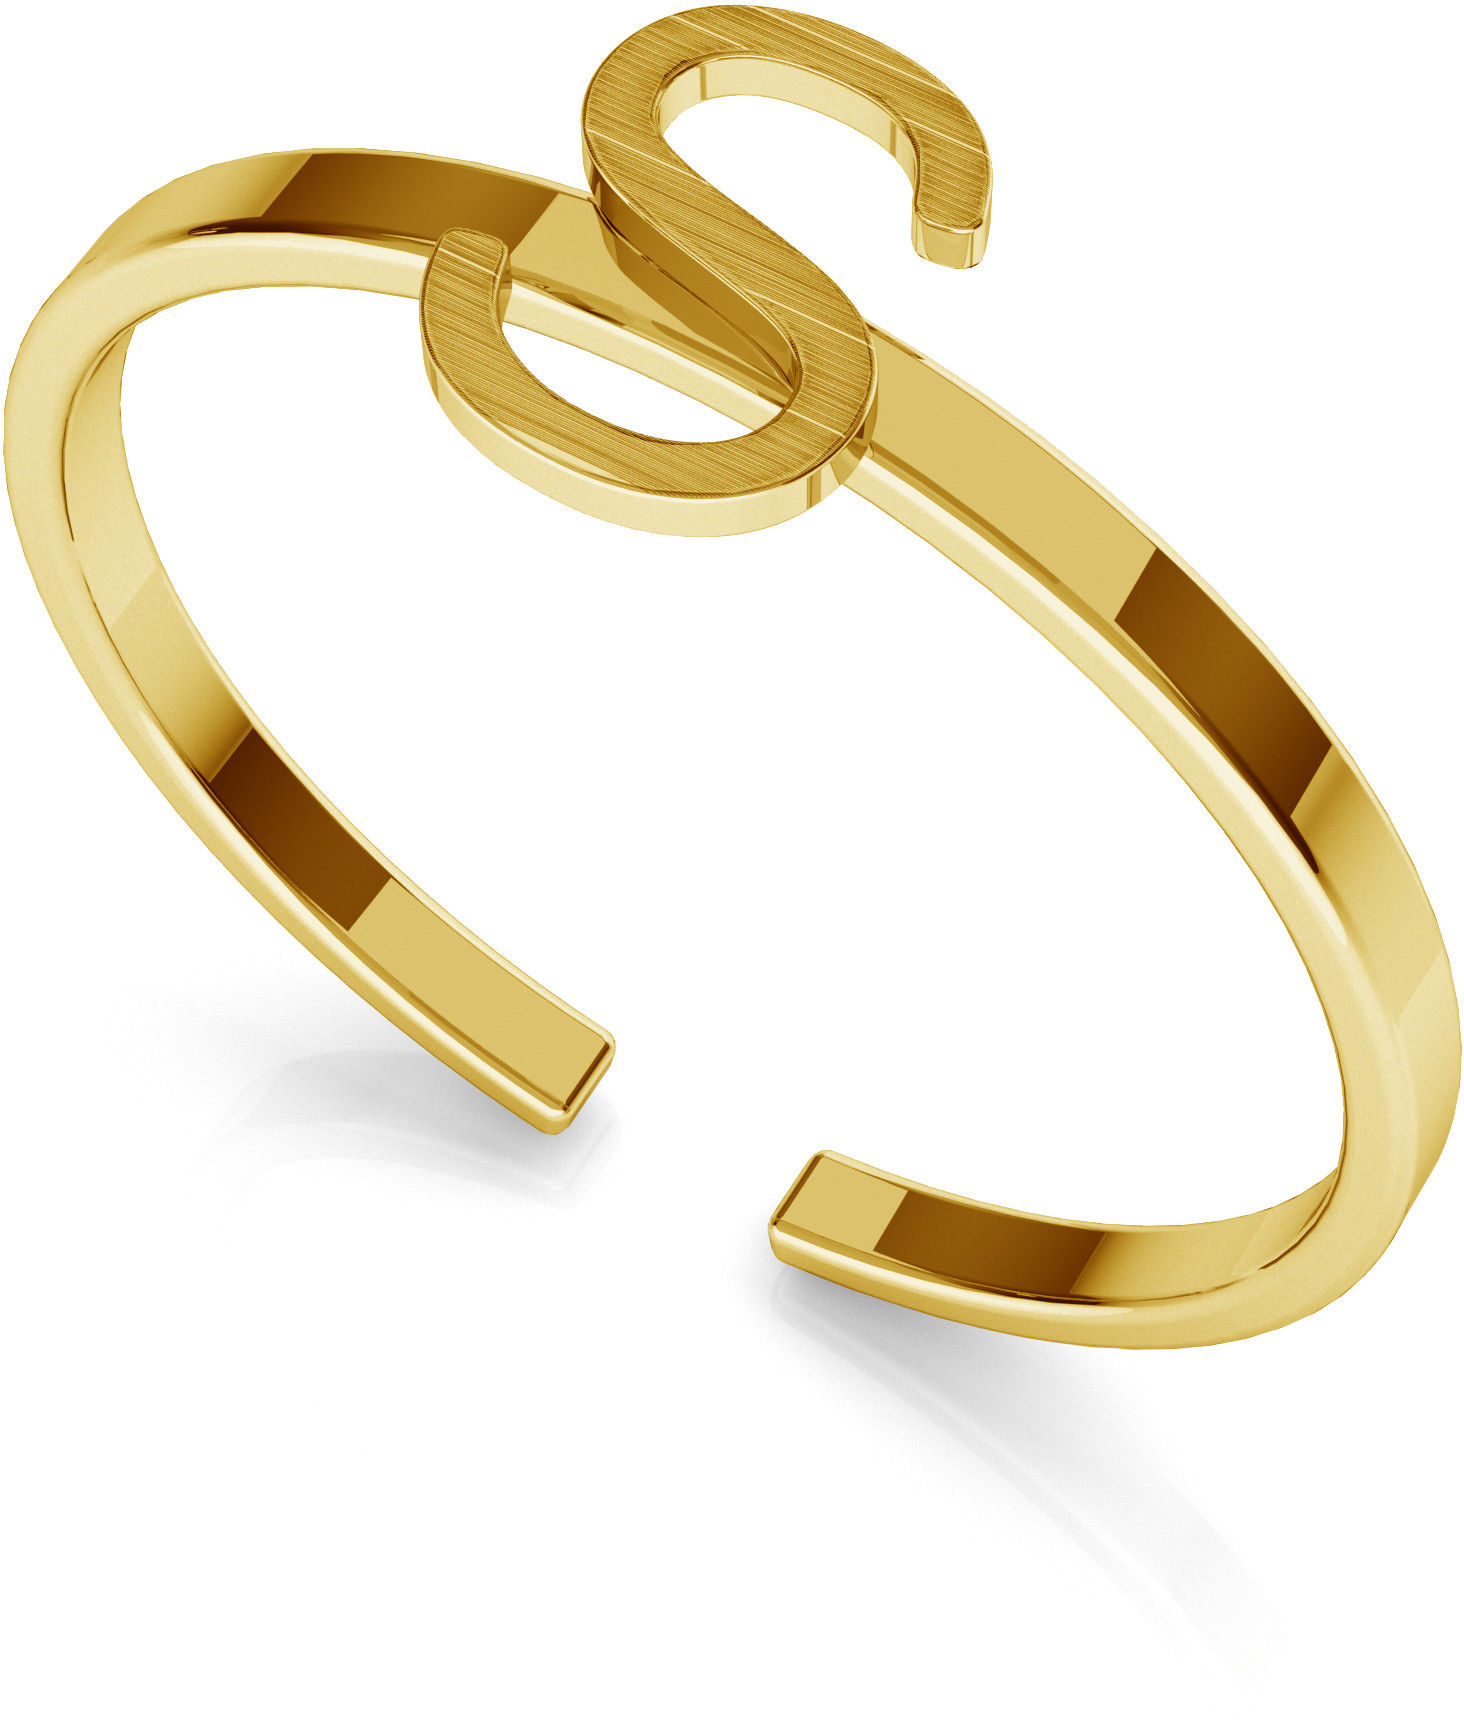 Srebrny pierścionek z literką My RING, srebro 925 : Litera - S, Srebro - kolor pokrycia - Pokrycie żółtym 18K złotem